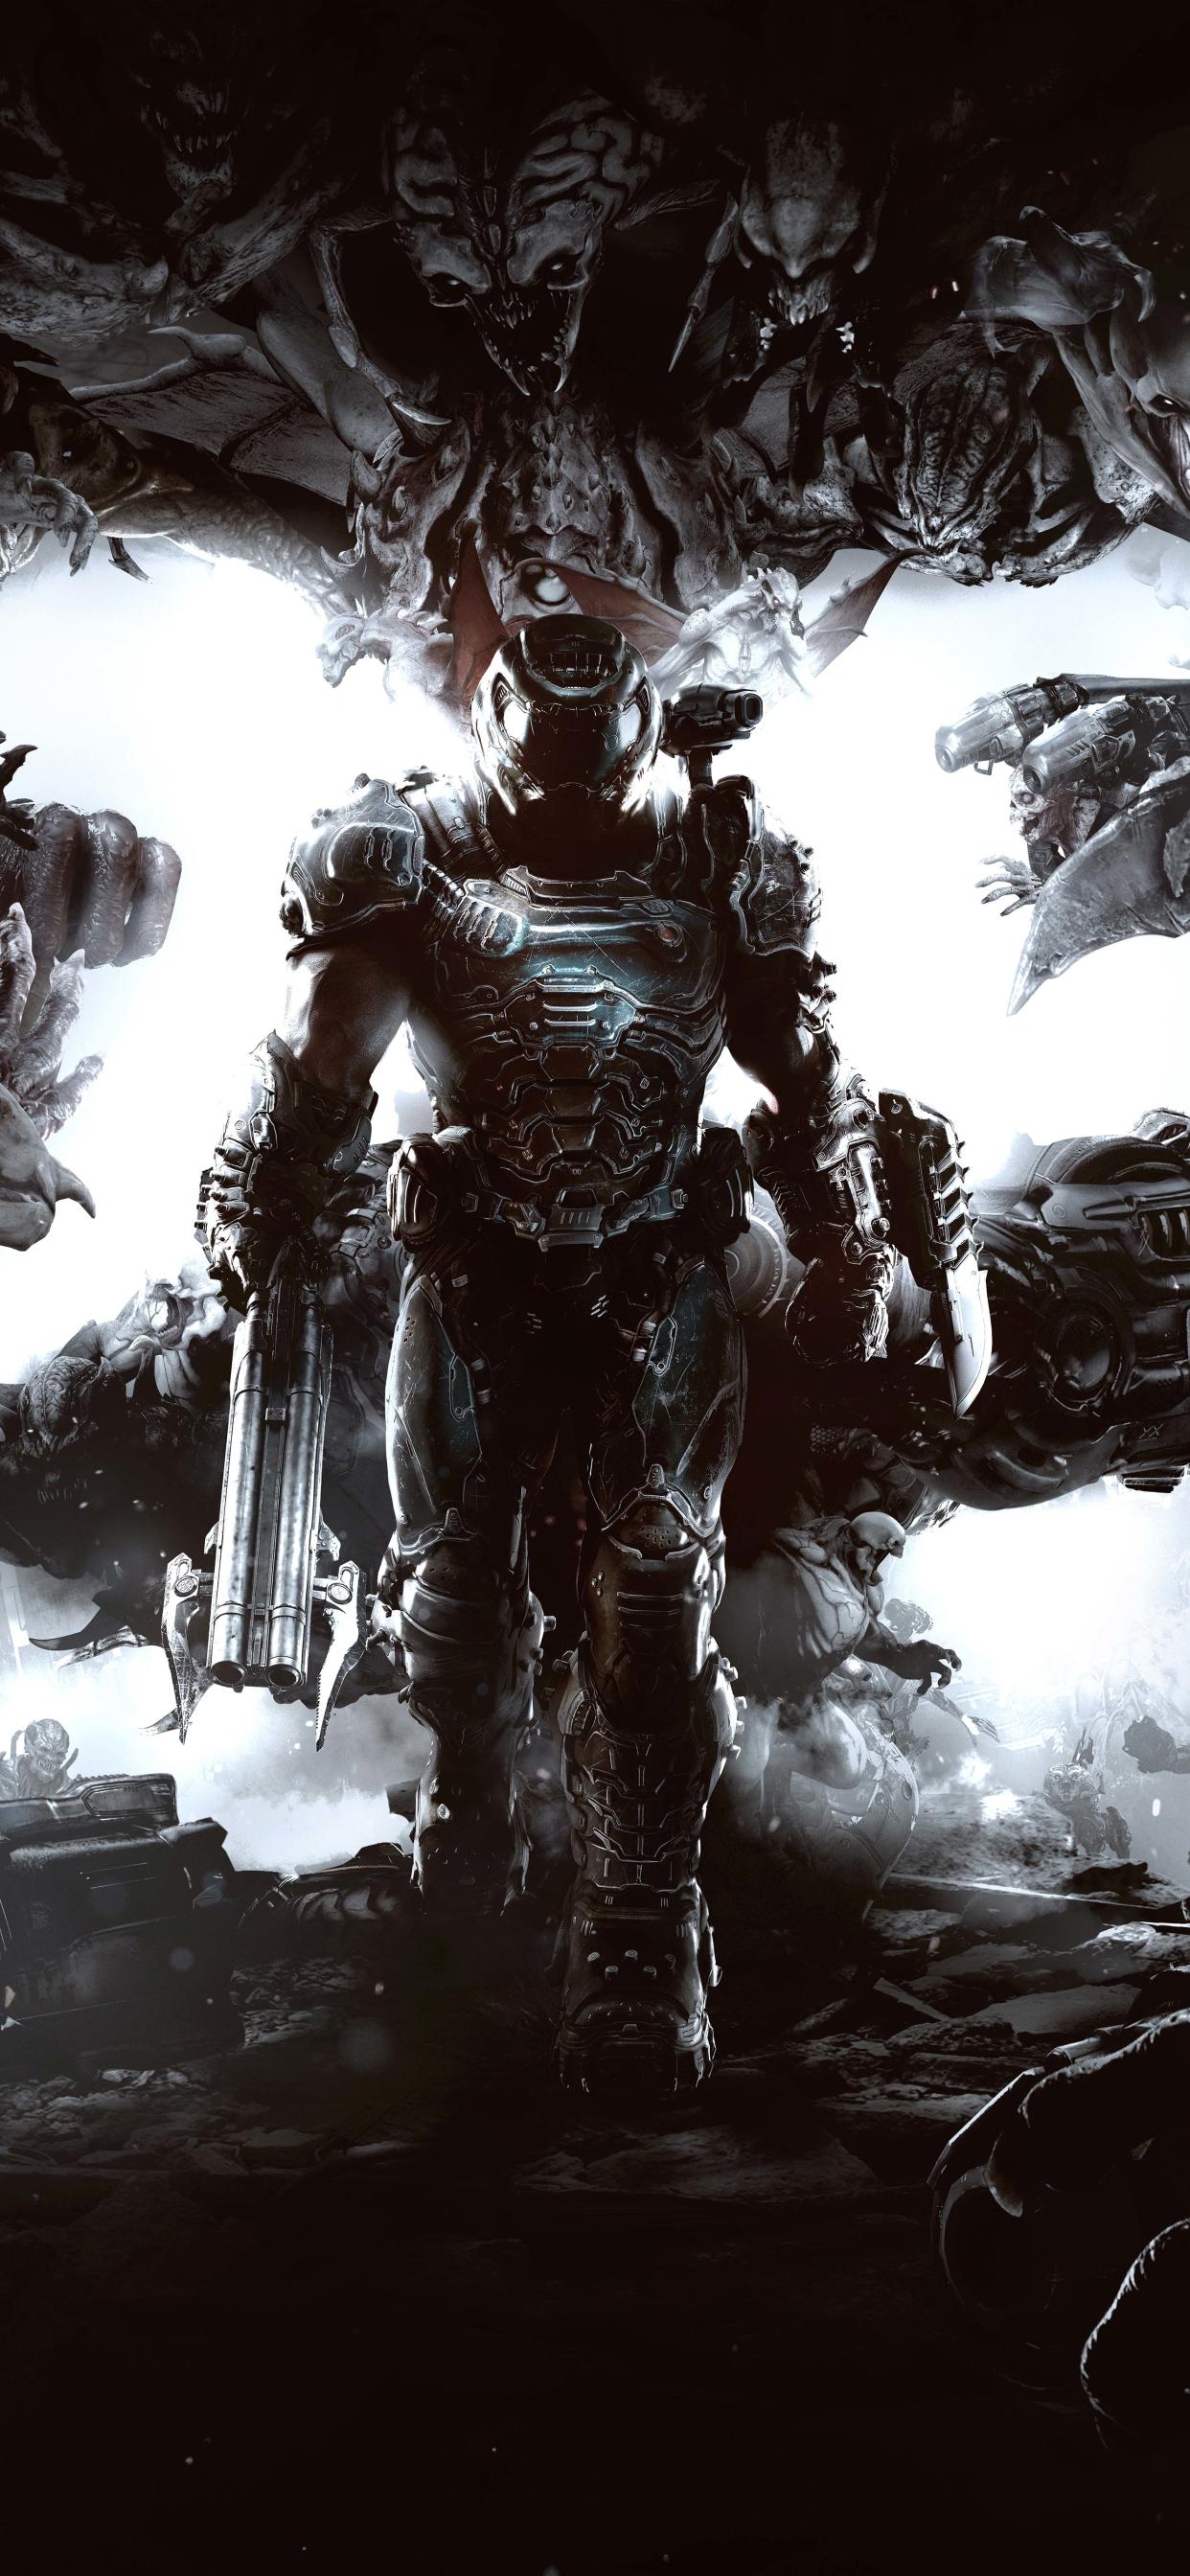 1242x2688 Doom Eternal Iphone Xs Max Wallpaper Hd Games 4k